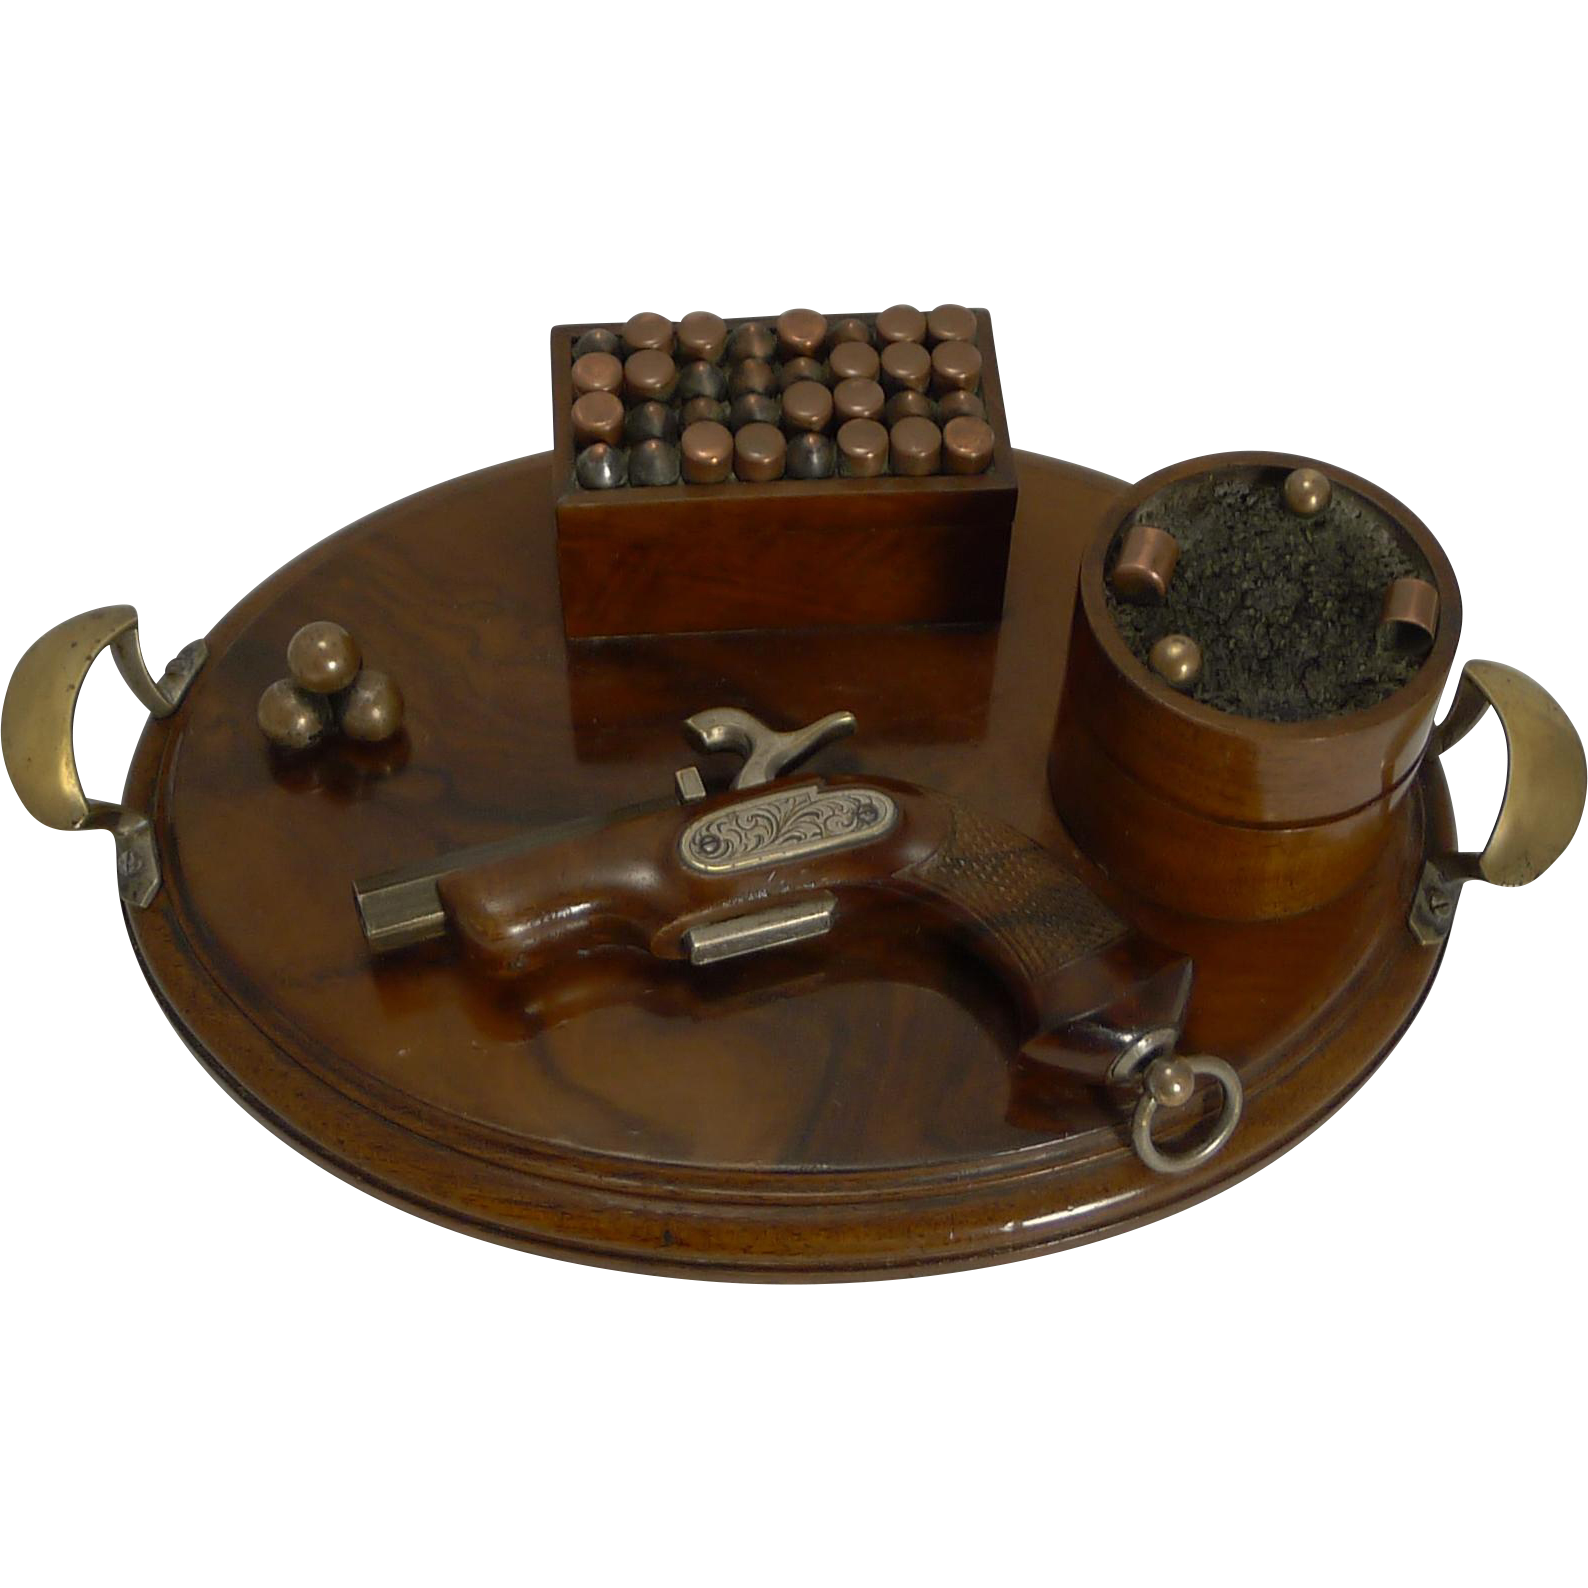 Rare Antique Walnut Desk Set - Gun Theme c.1890